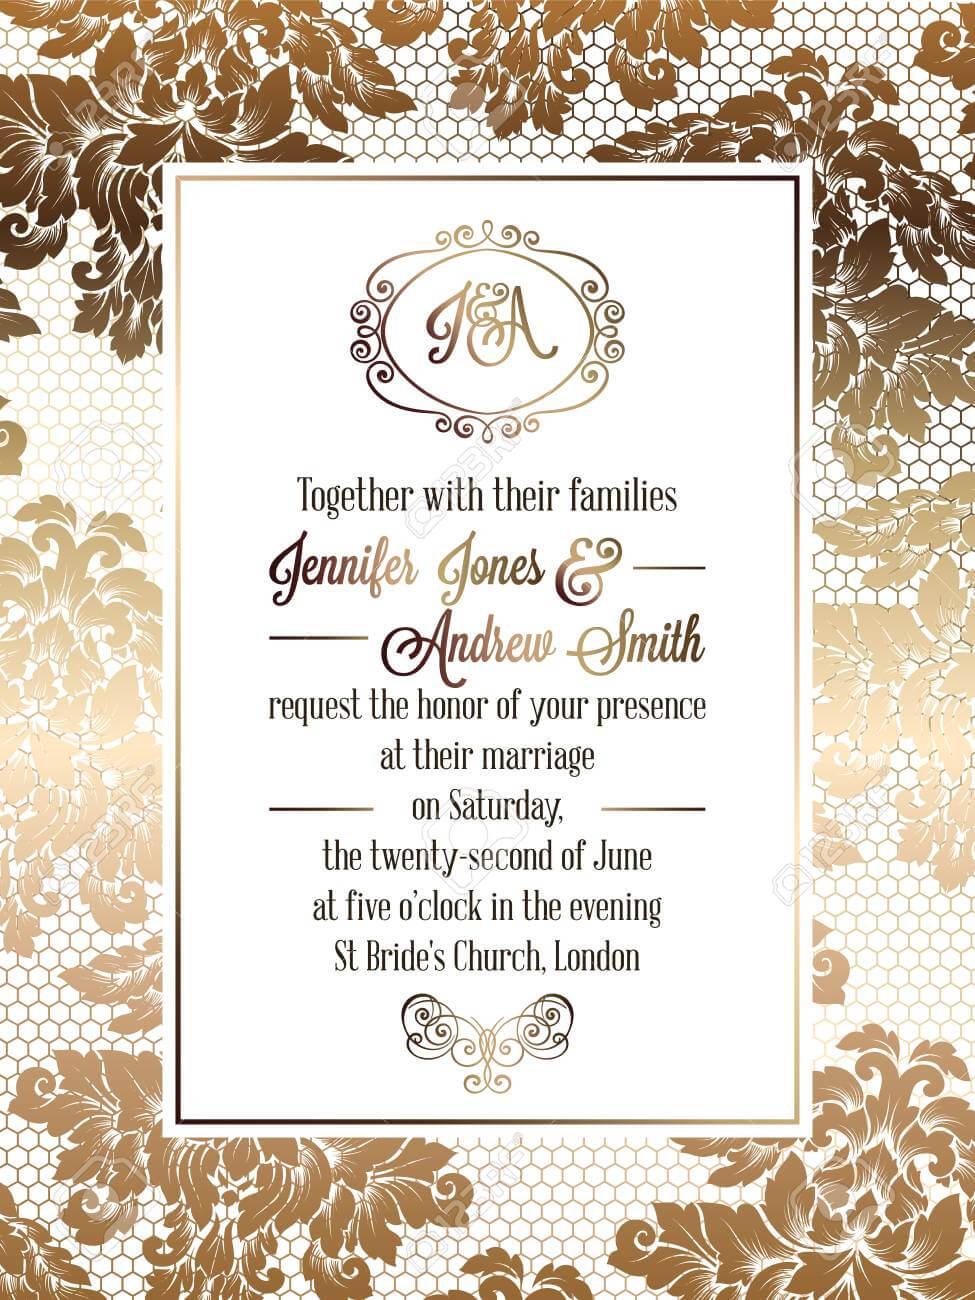 Vintage Baroque Style Wedding Invitation Card Template.. Elegant.. In Free E Wedding Invitation Card Templates